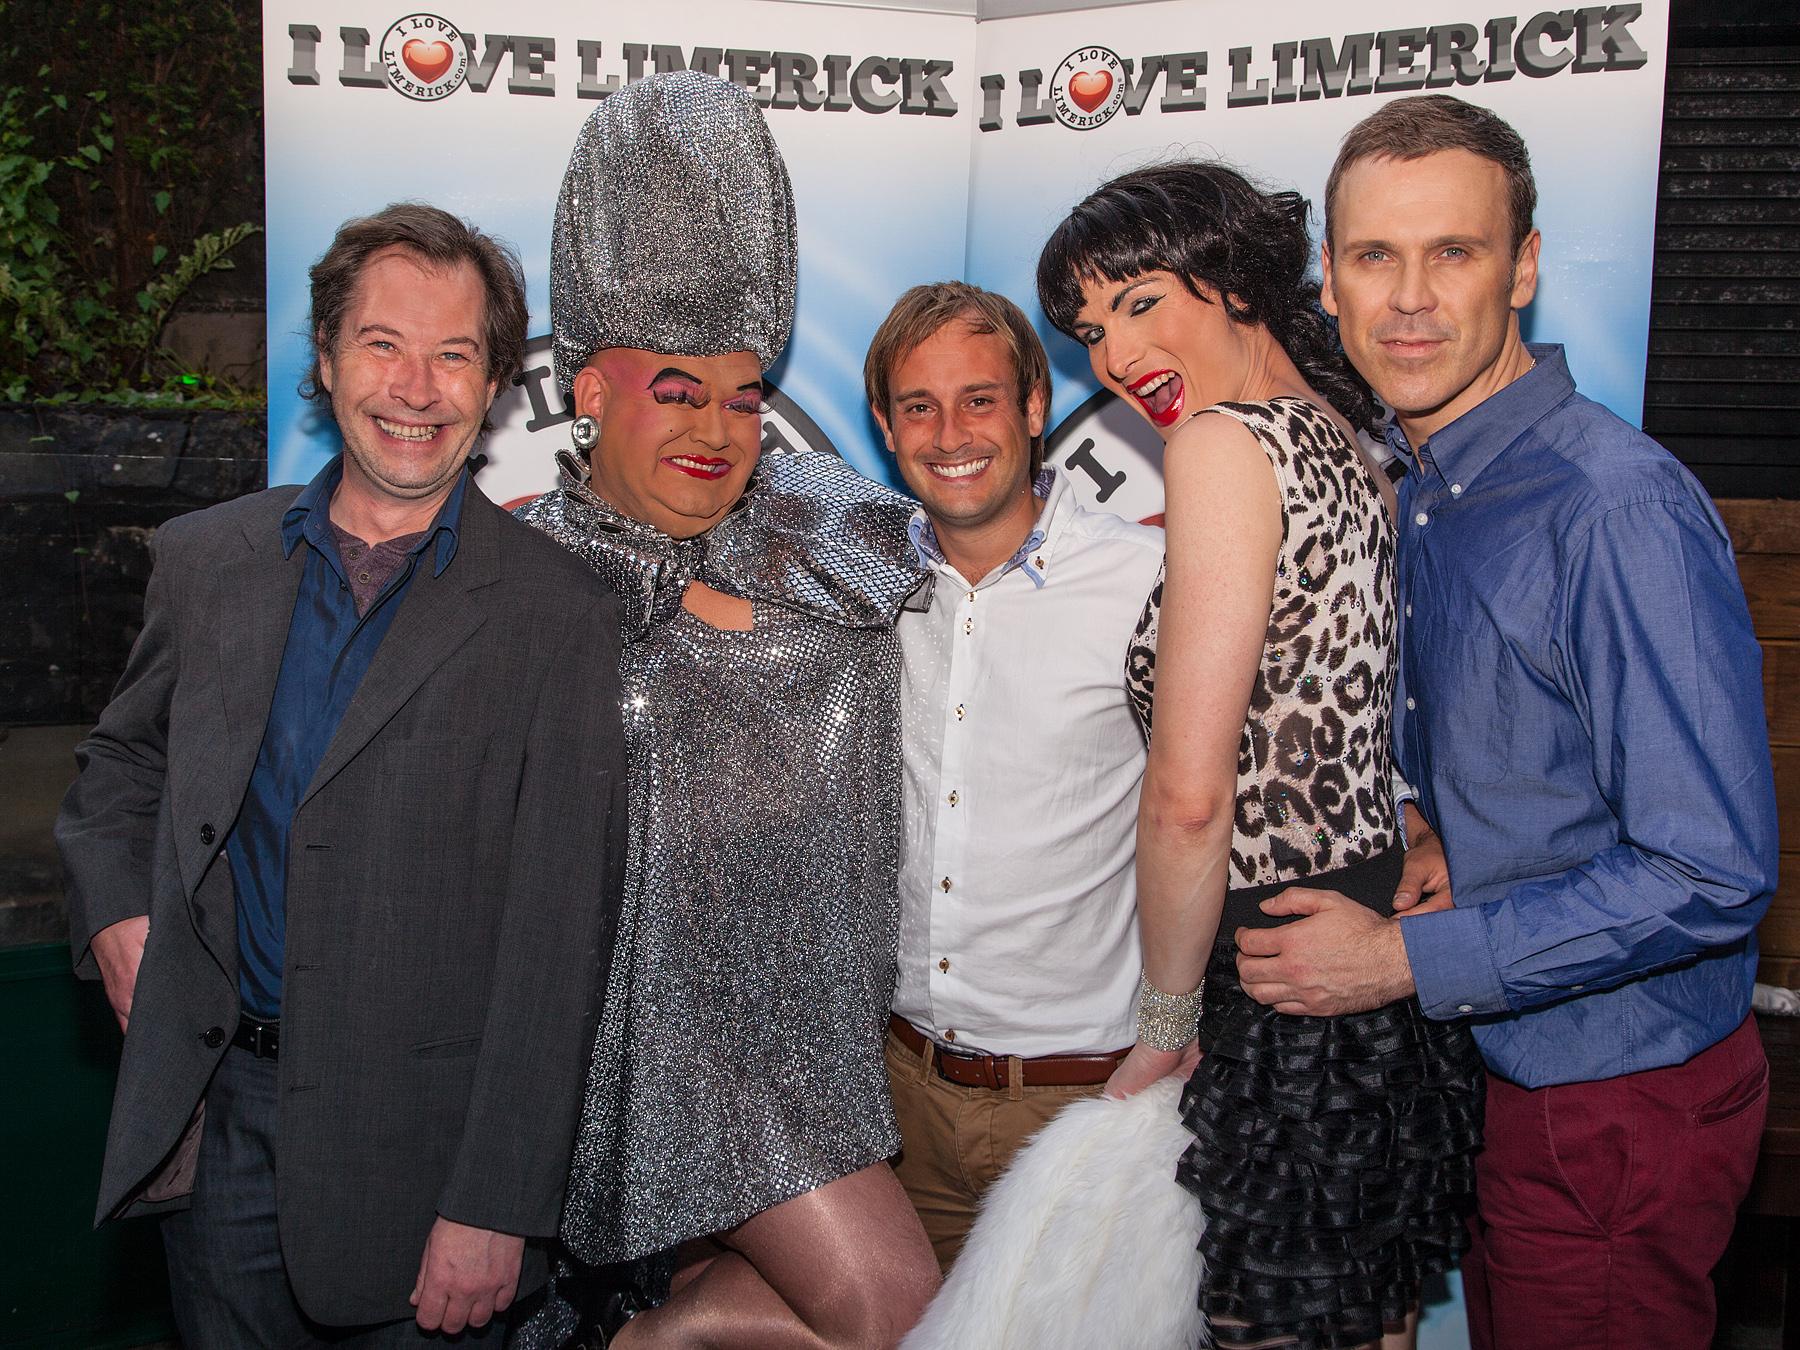 Limerick Pride 2014